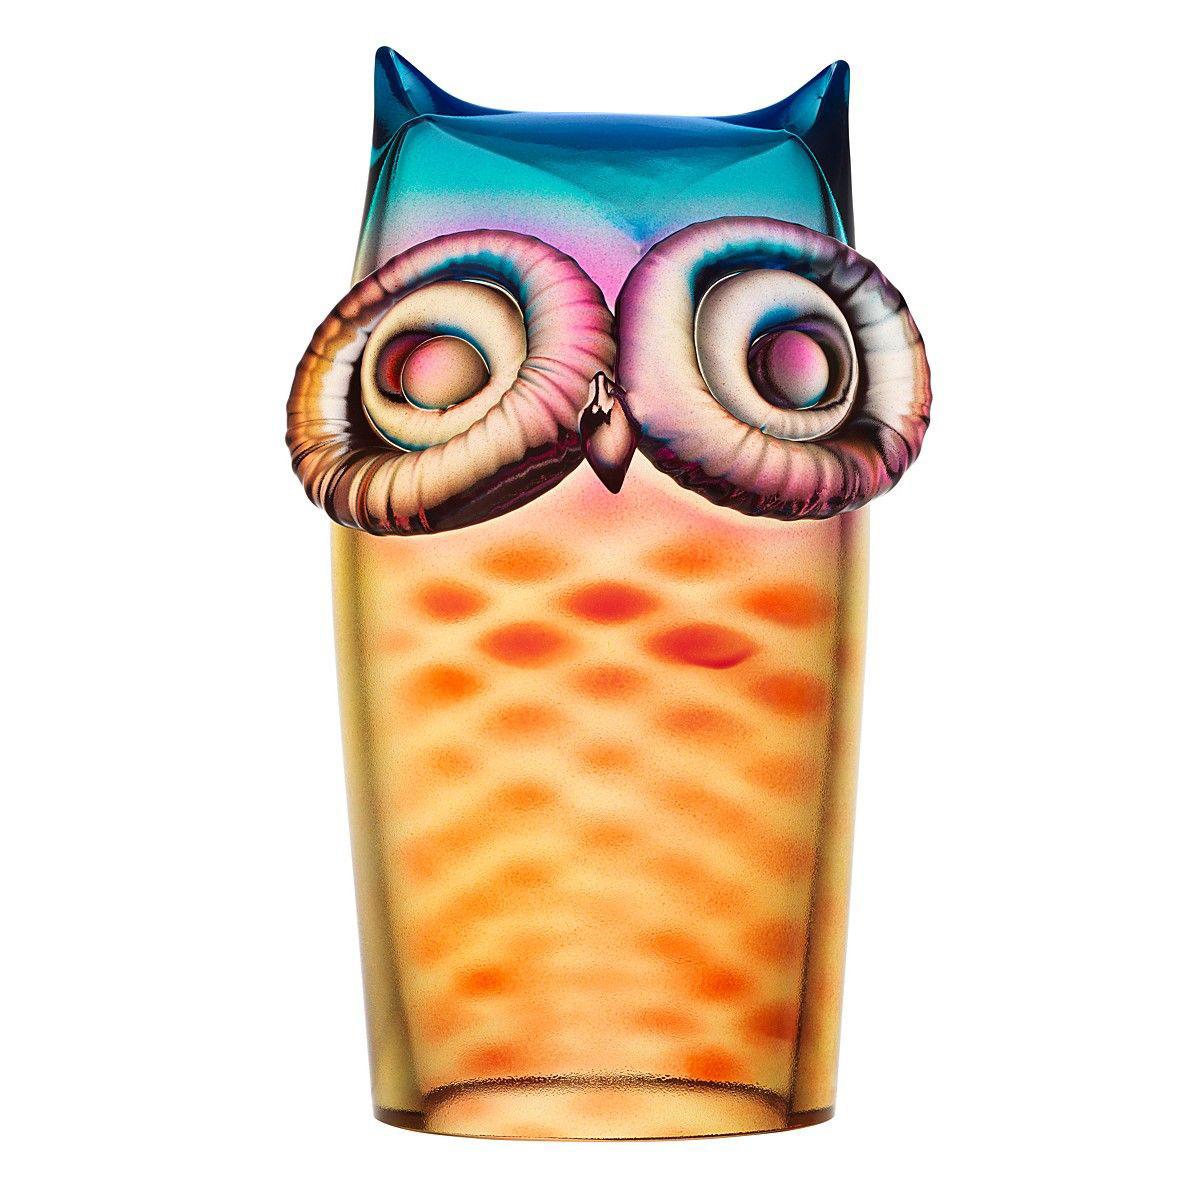 Obegi Home Accessories Kosta Boda My Wide Life Owl Sculpture